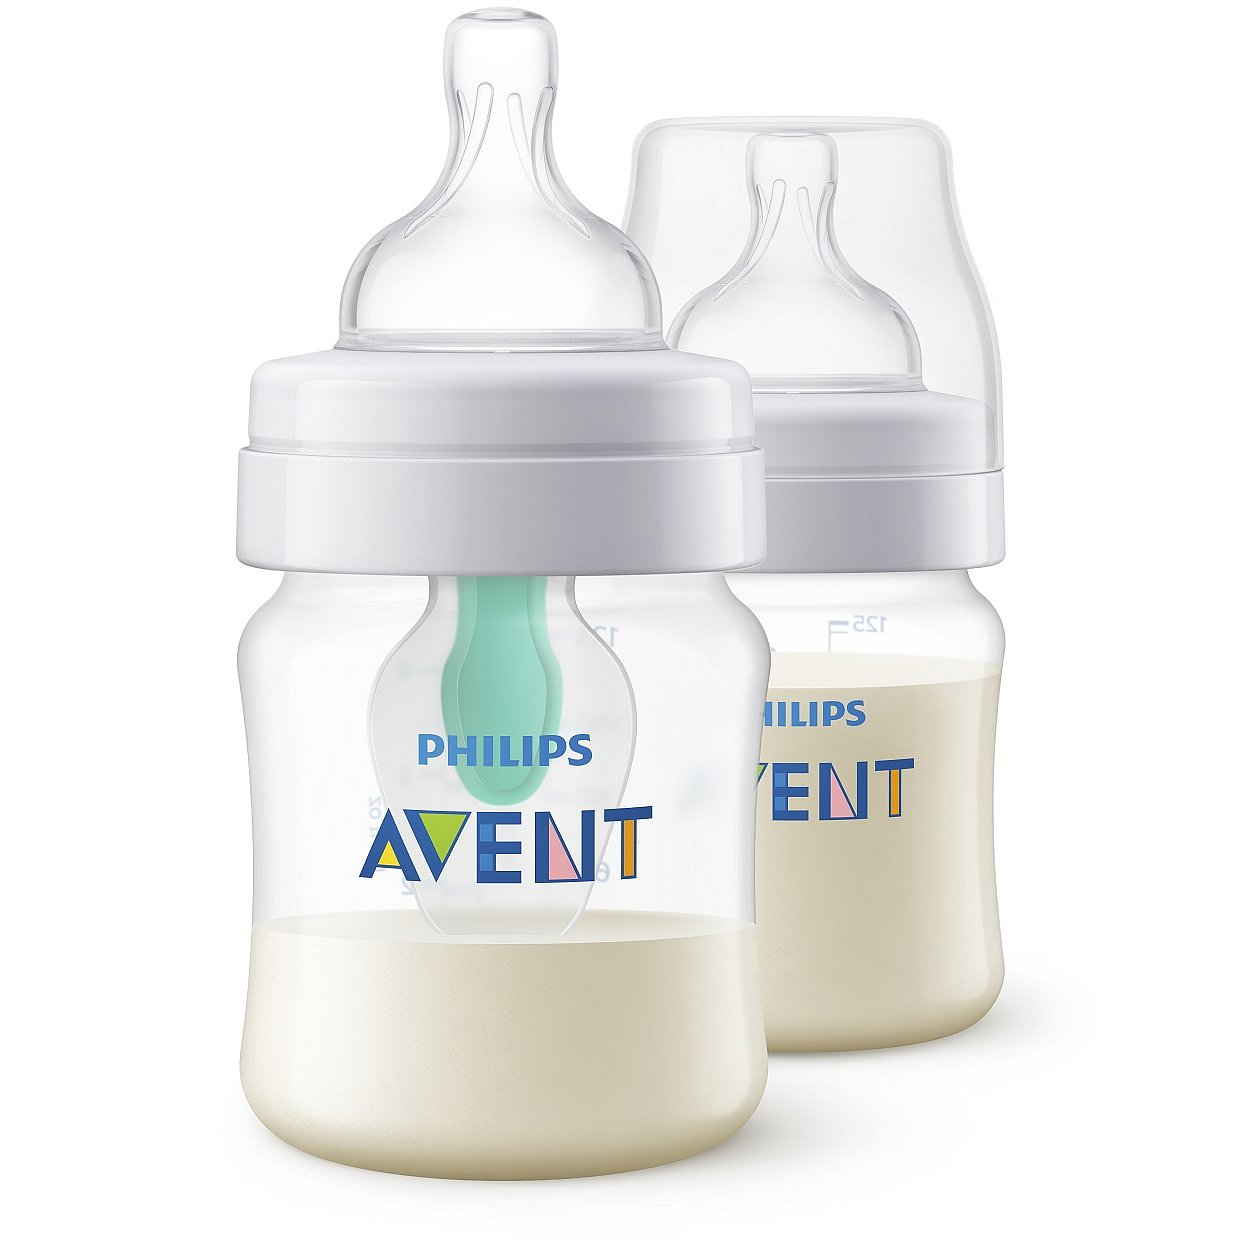 AVENT Láhev Anti-colic 125 ml (2 ks) s ventilem AirFree - Philips antikolikové kojenecké lahve SCF810/24